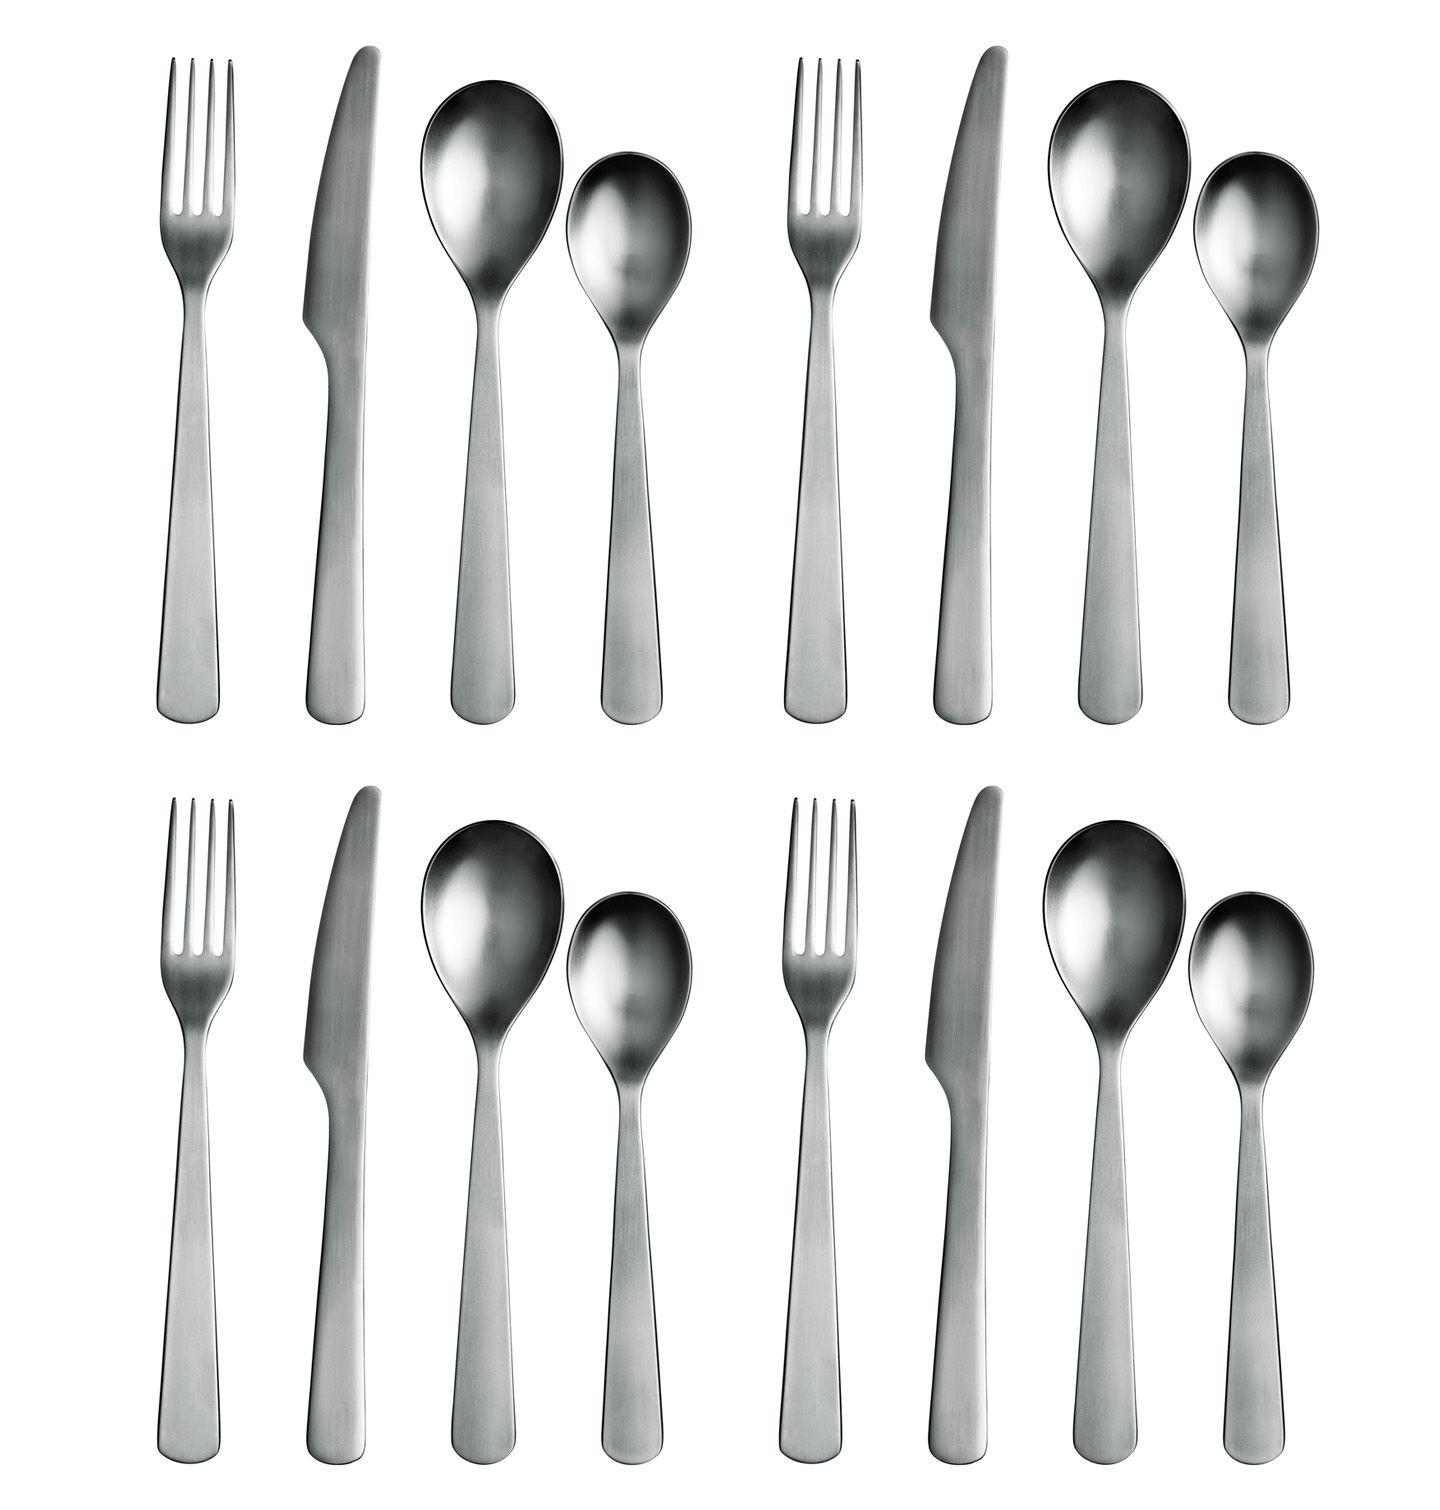 Tischkultur - Bestecke - Normann Besteckgarnitur Set mit 16 Teilen - Normann Copenhagen - Edelstahl matt - Stahl